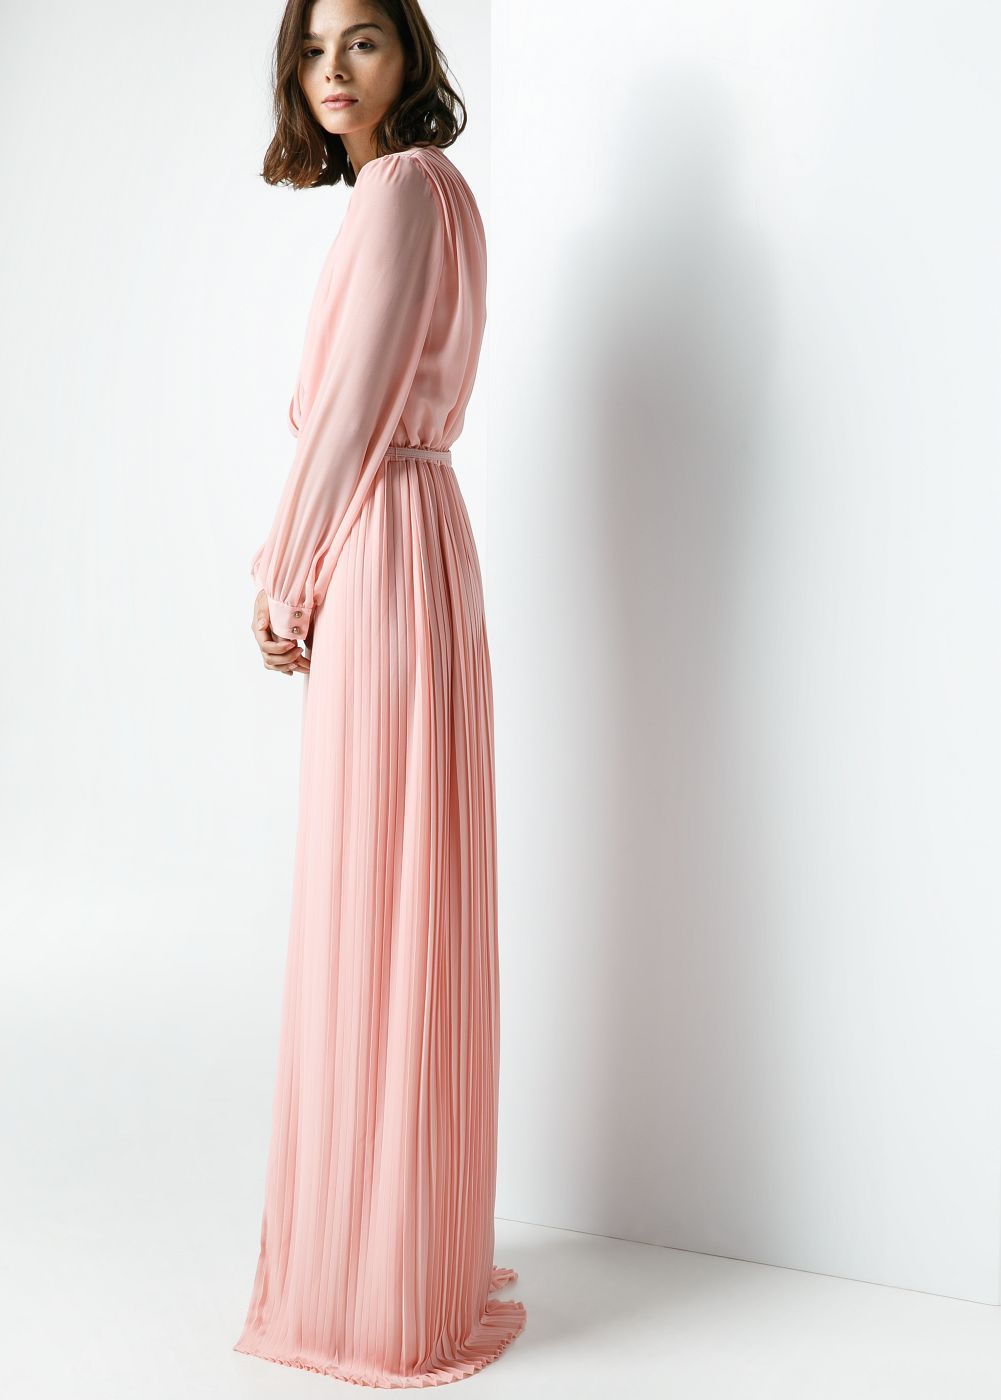 Vestido largo capa - Mujer   For wedding   Pinterest